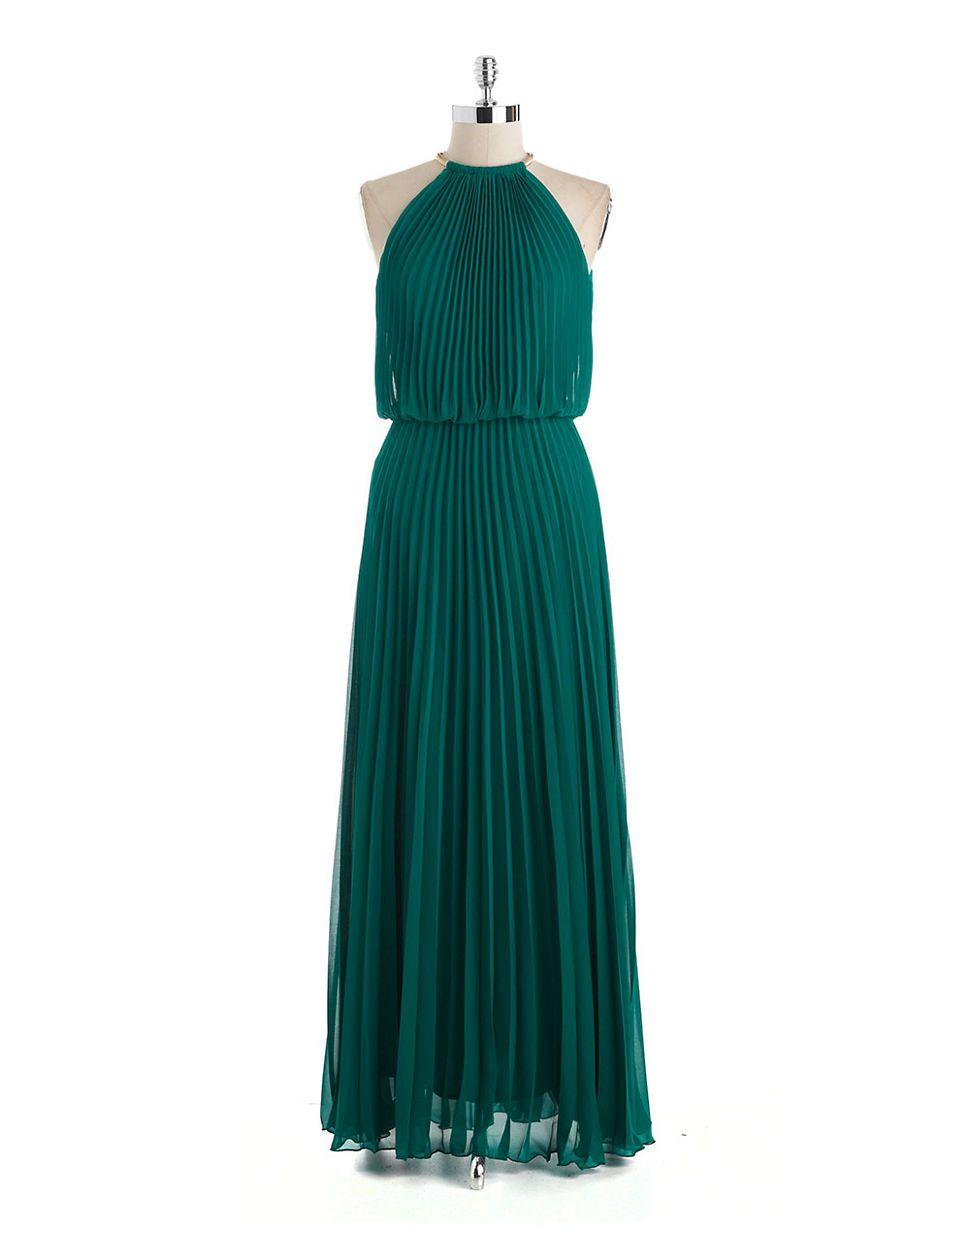 5f1b48c03abca Pin by Shop Gal on Fashion & Style | Chiffon gown, Emerald ...